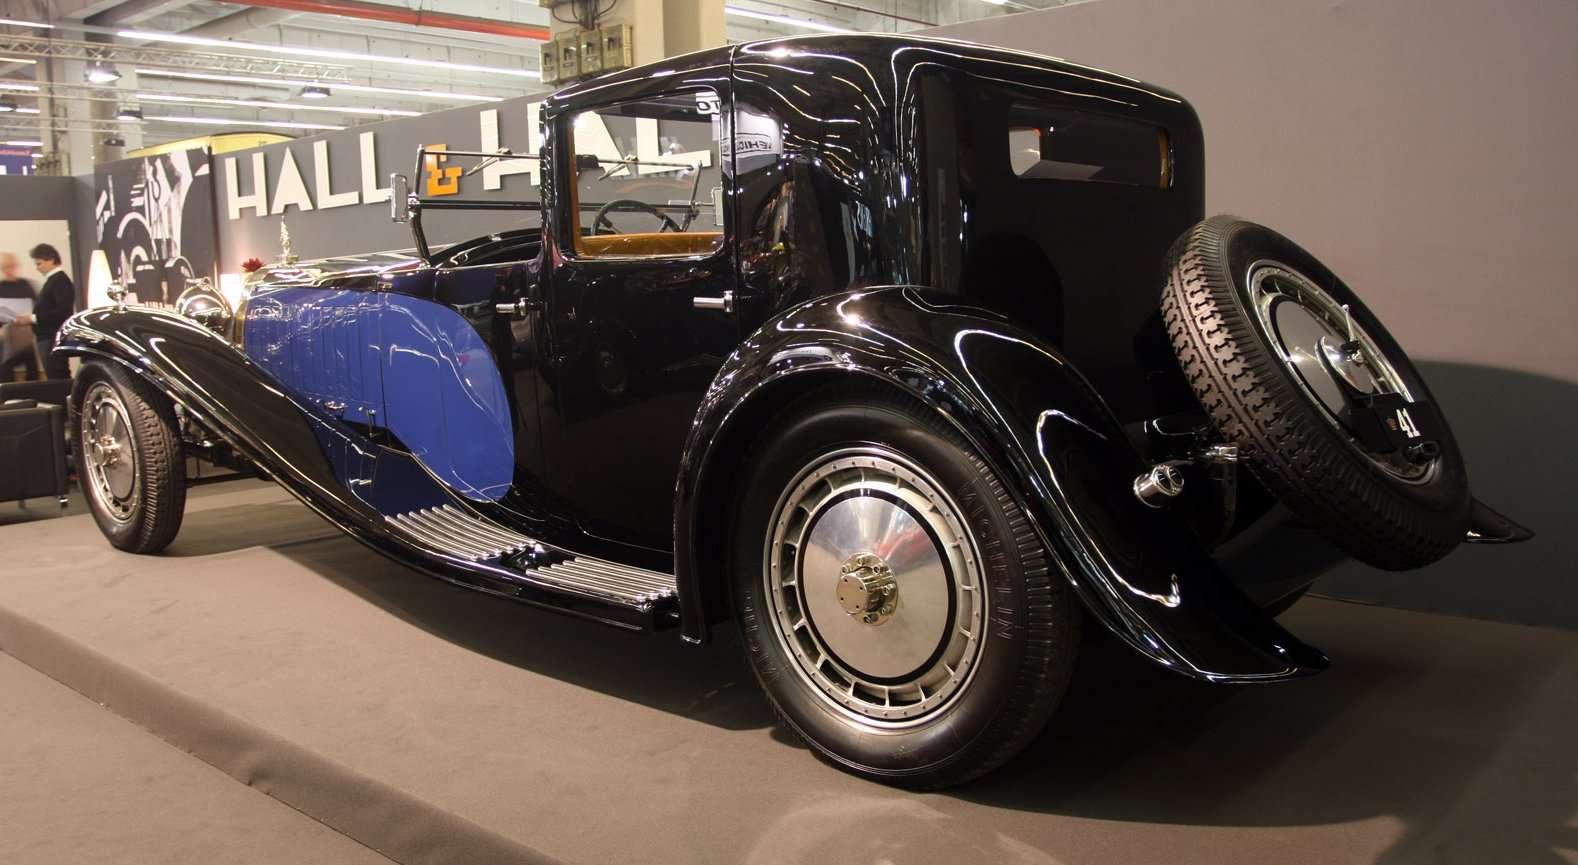 world otomotif bugatti type 41 royale coupe napoleon. Black Bedroom Furniture Sets. Home Design Ideas